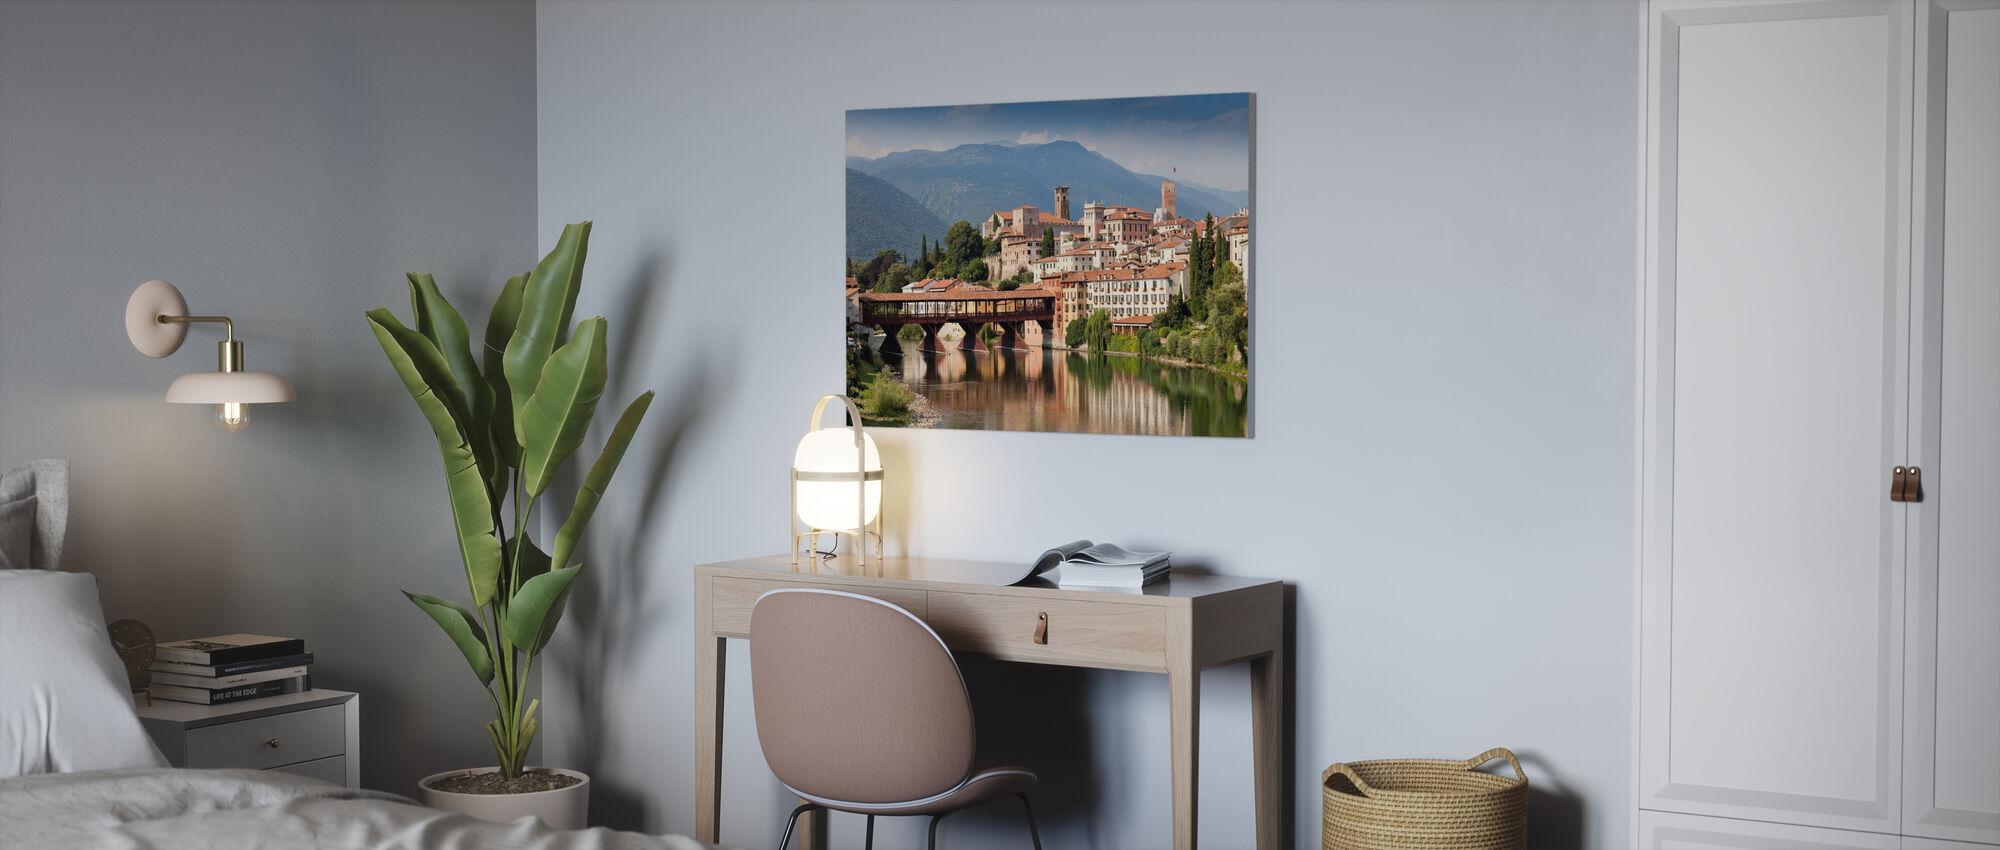 Walls and Bridges - Canvas print - Office